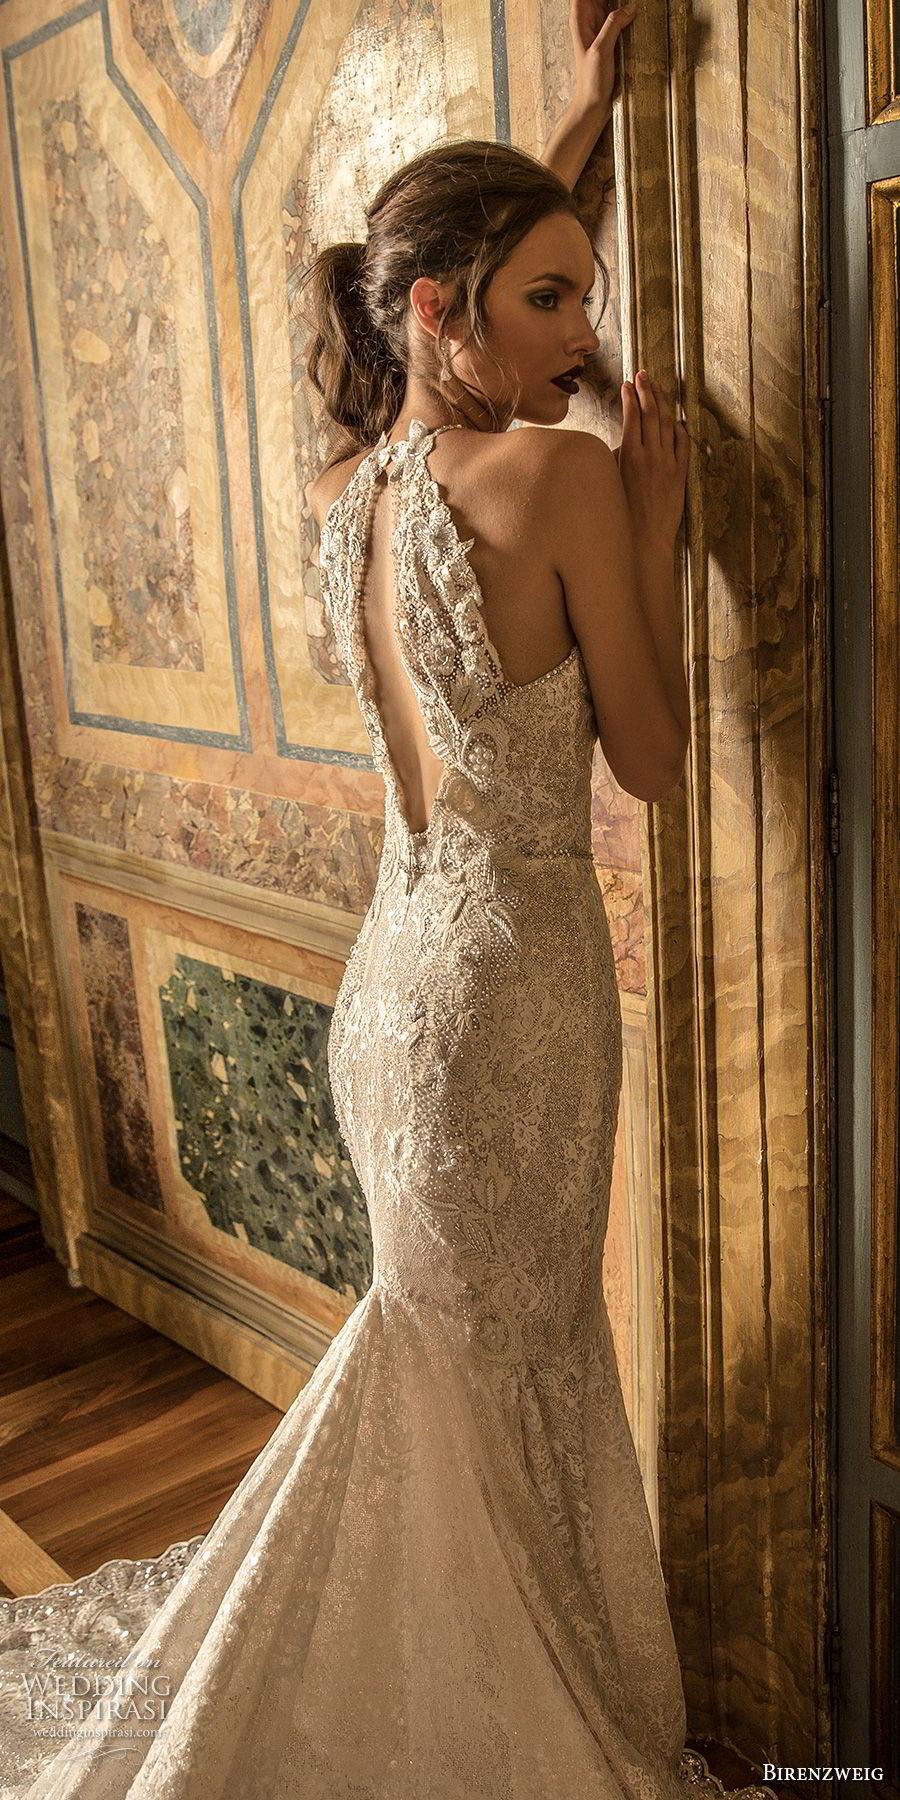 birenzweig 2018 bridal sleeveless halter neck full embellshemt elegant fit and flare wedding dress keyhole back royal train (17) zbv